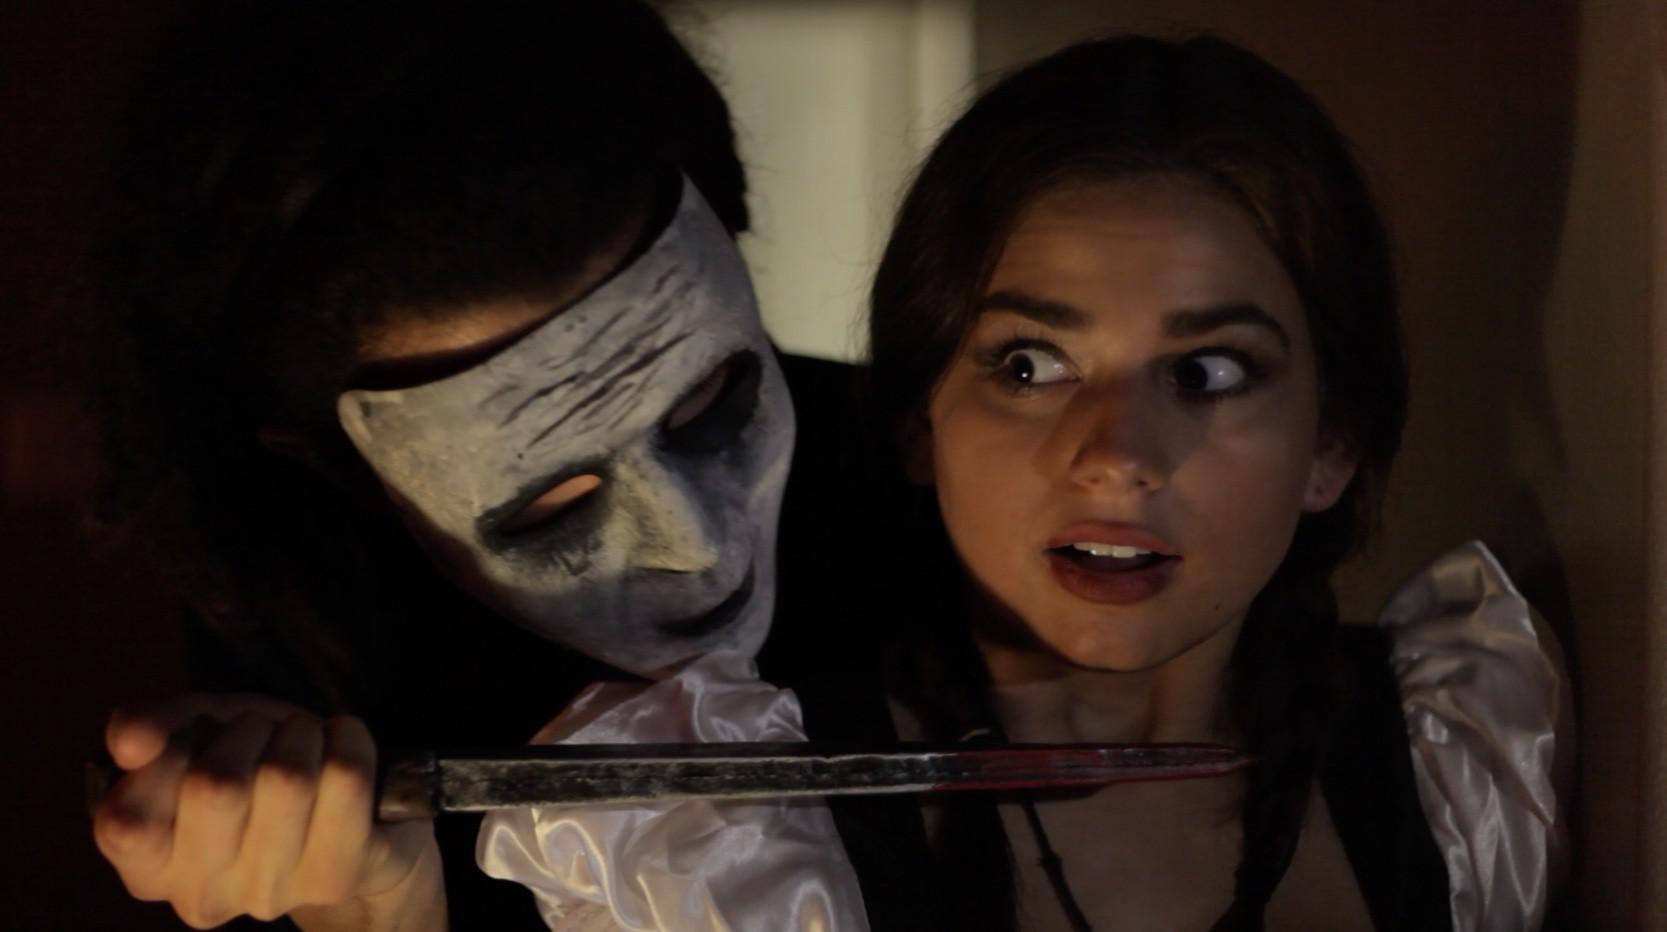 Jordan Phipps stars in the horror anthology '10/31', an Official Selection at the Halloween International Film Festival, Oct. 25-27, 2018 in Kill Devil Hills.